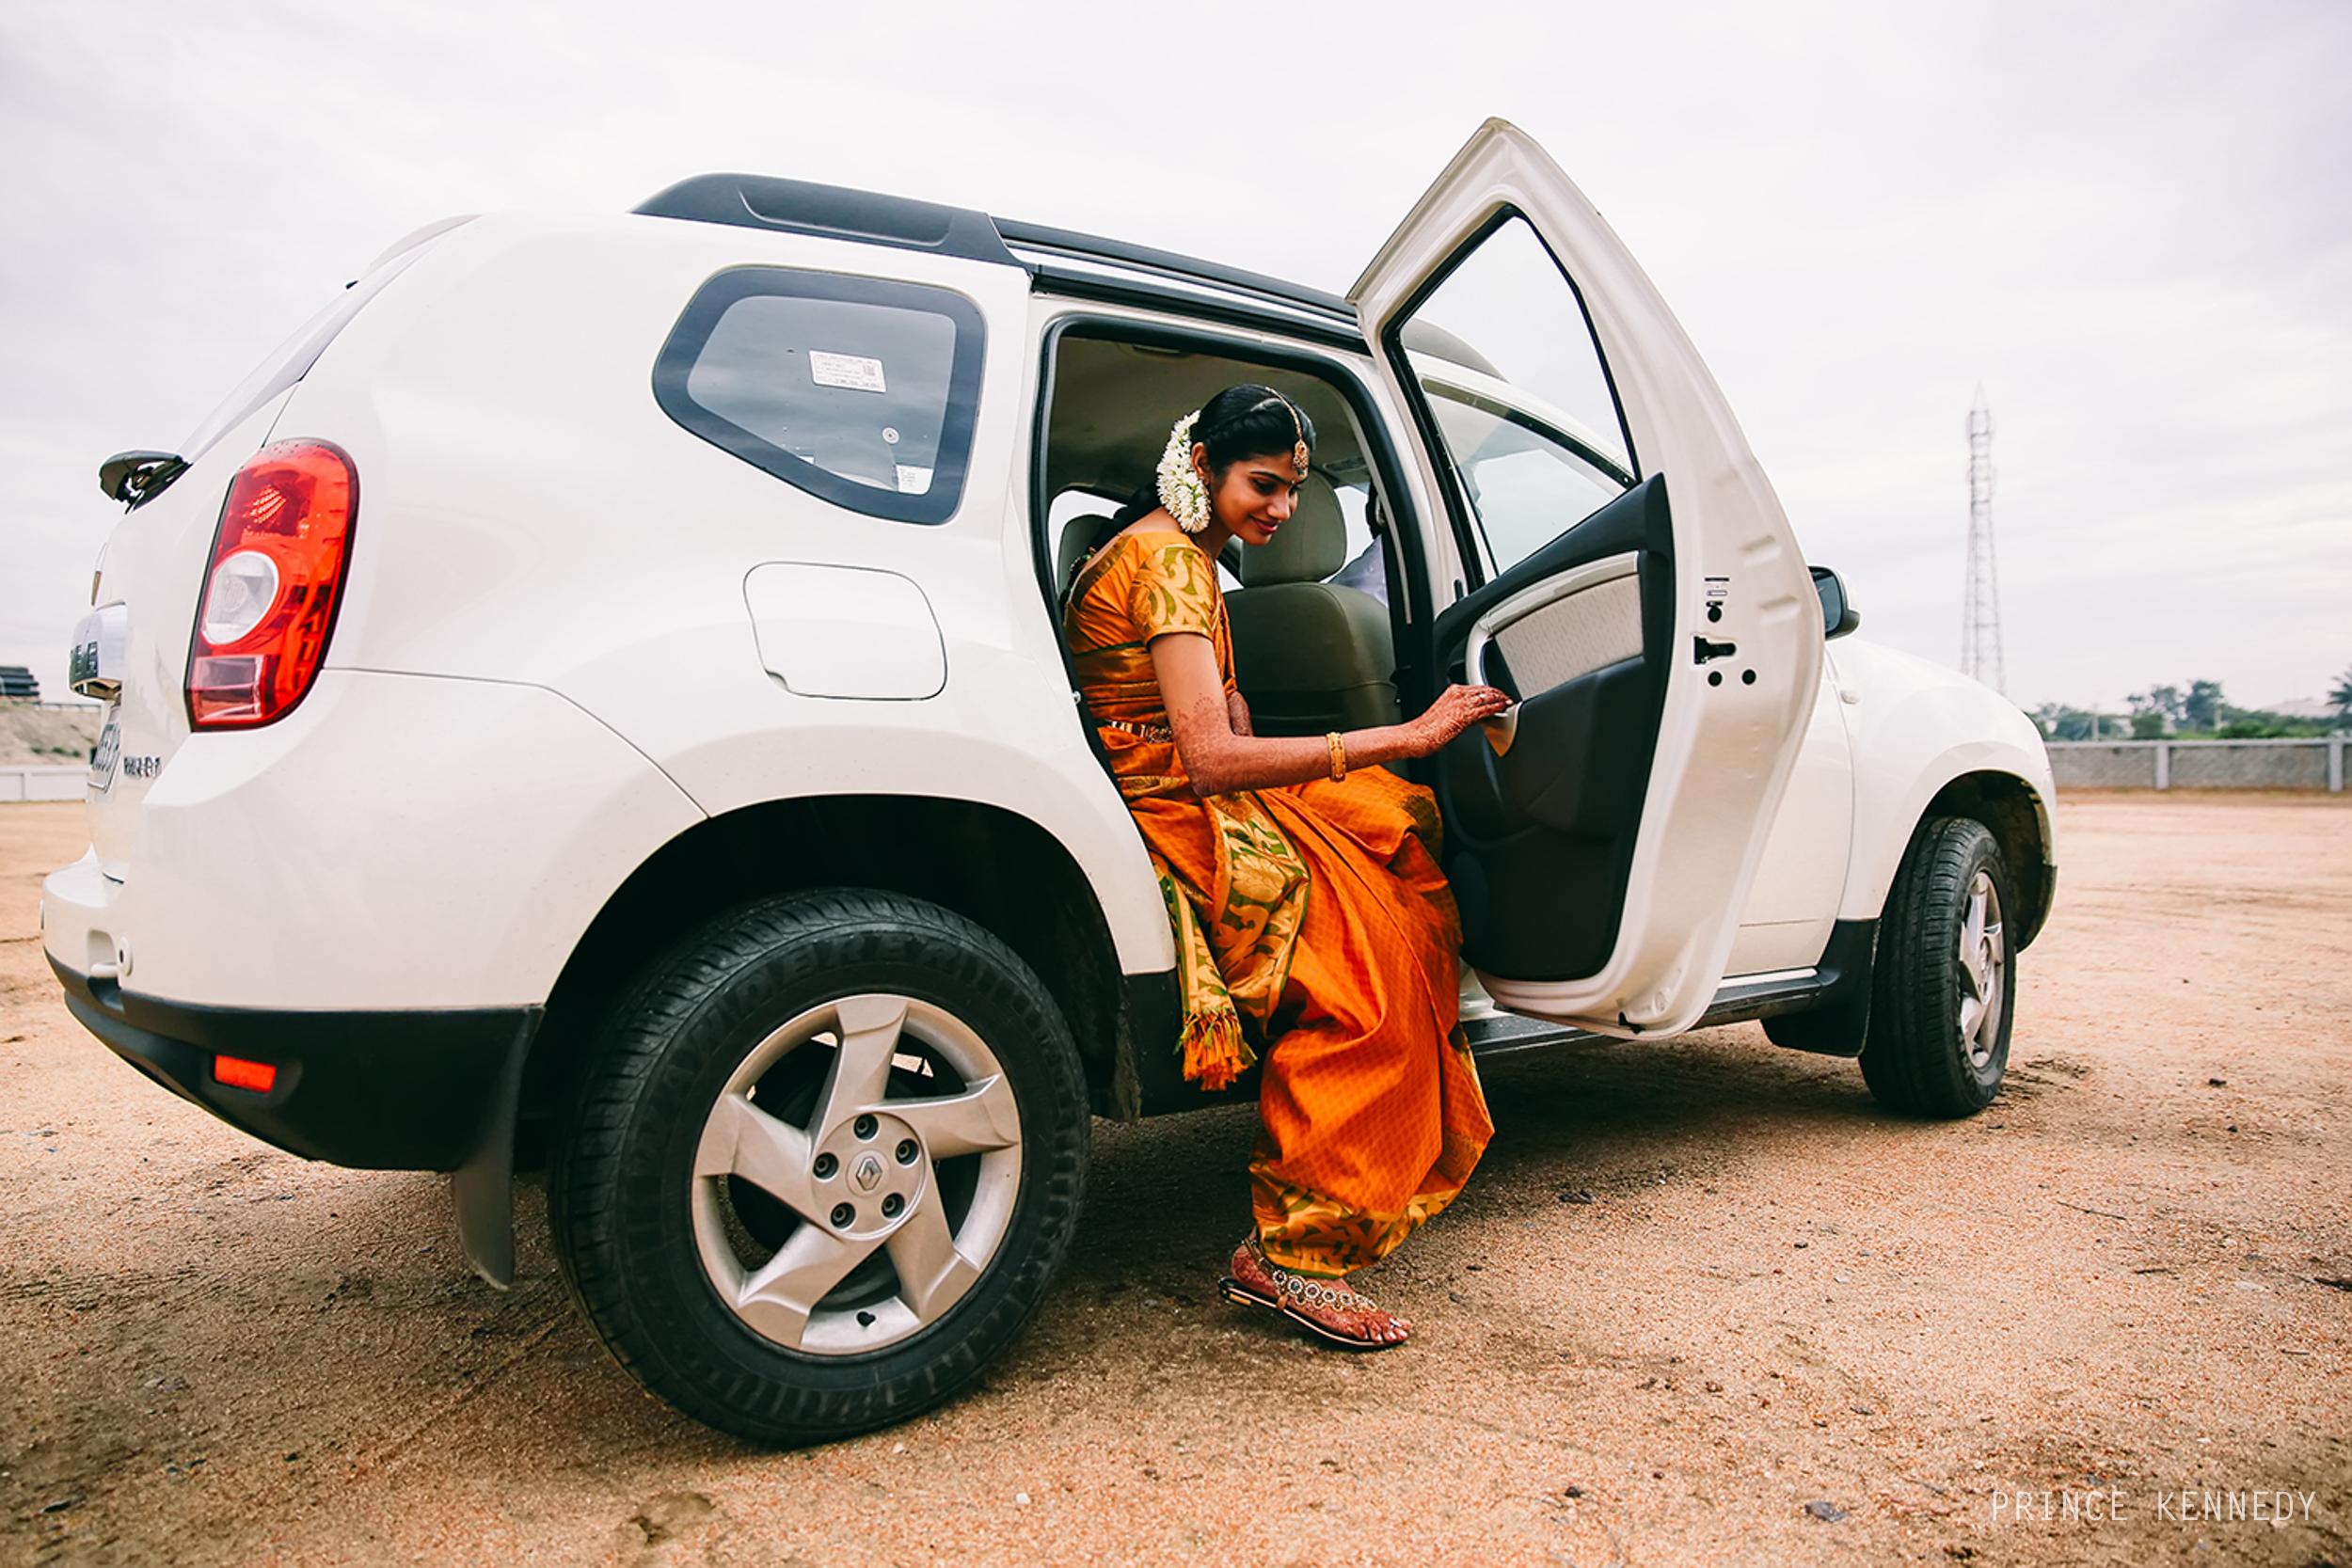 Wedding-weddings-candid-photography-chennai-photographer-best-photography2.jpg